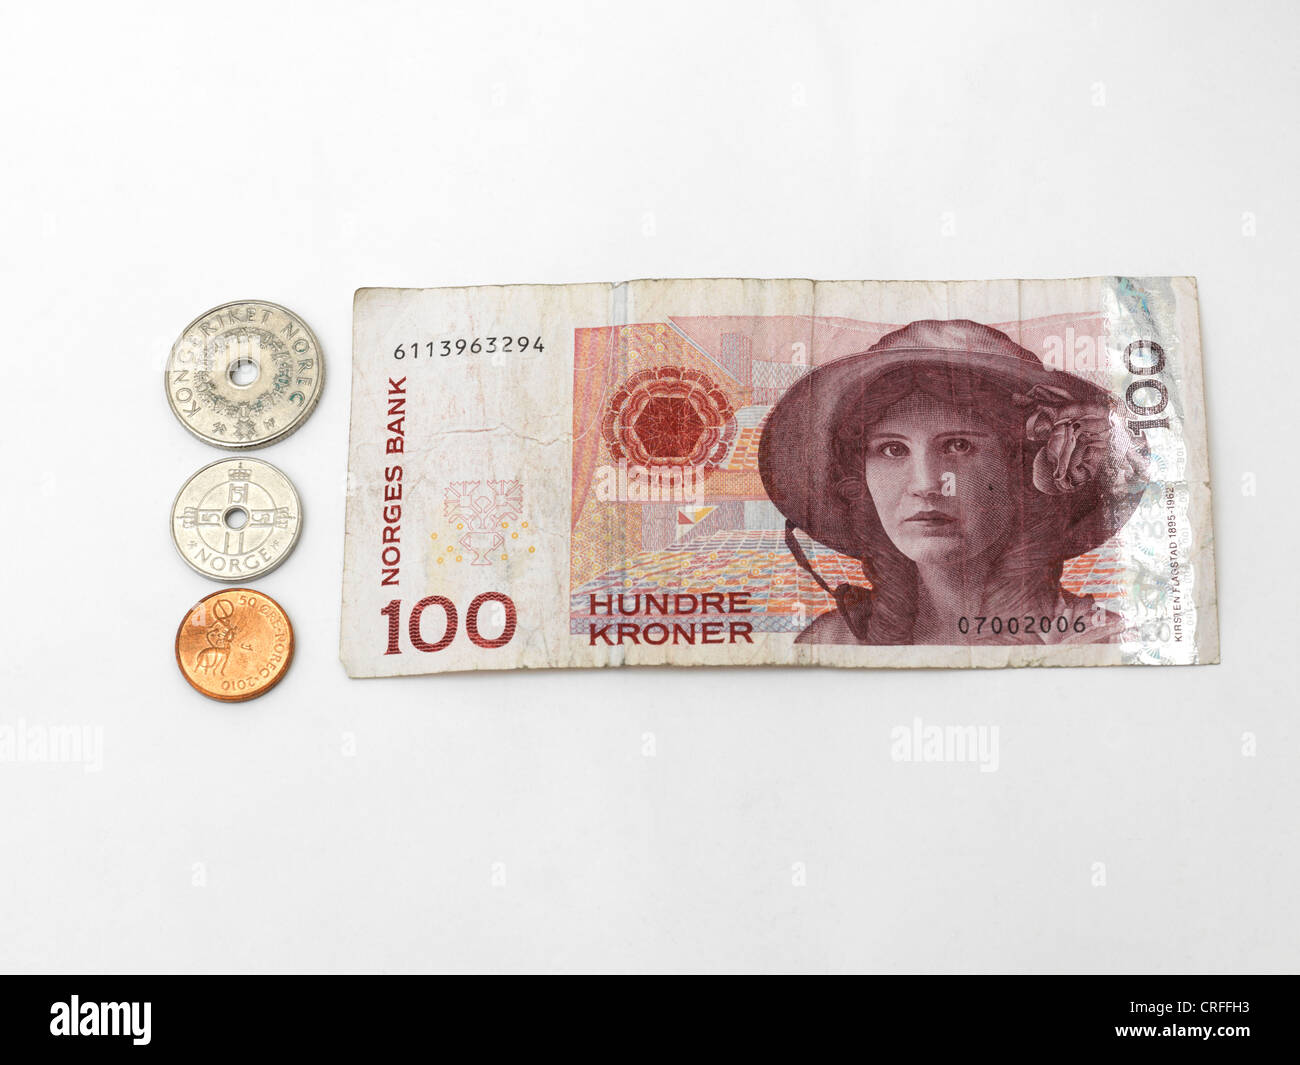 Norwegische Kronen Banknoten Und Münzen 1 Krone 5 Kronen 50 öre